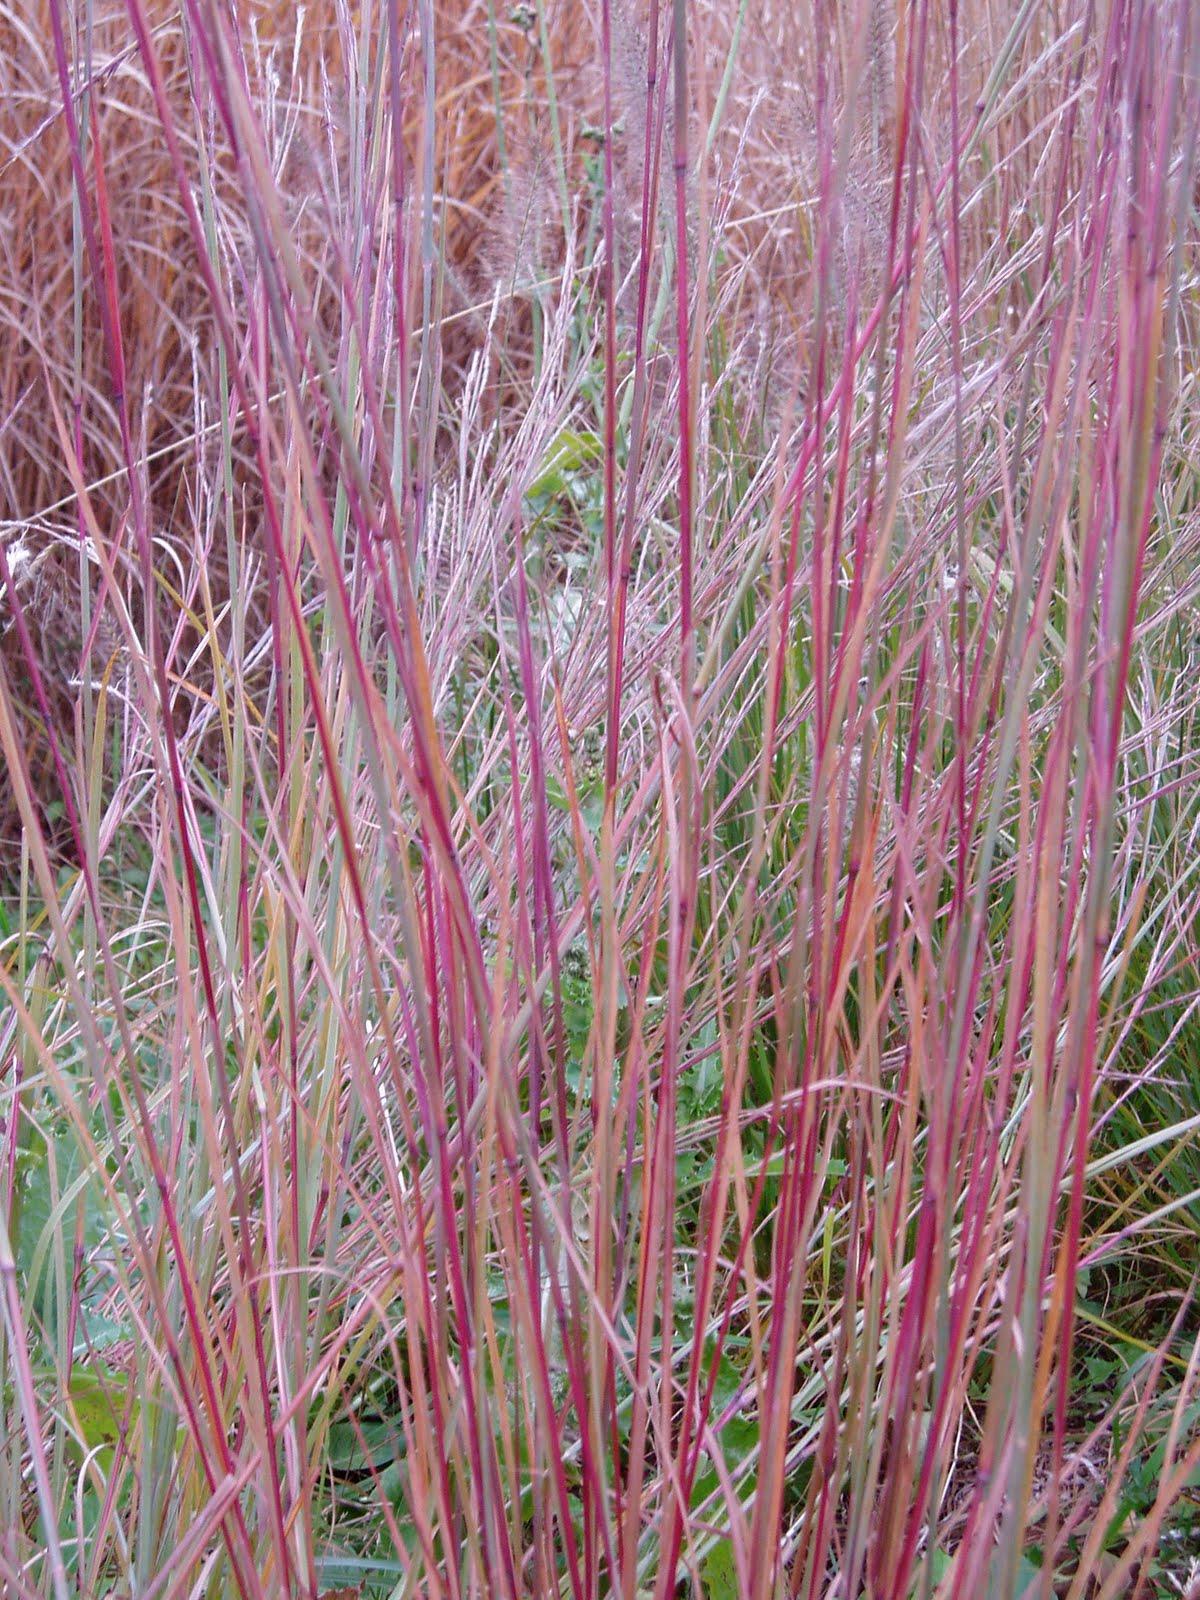 Lovegrass farm schizachyrium scoparium little bluestem for Small red ornamental grass